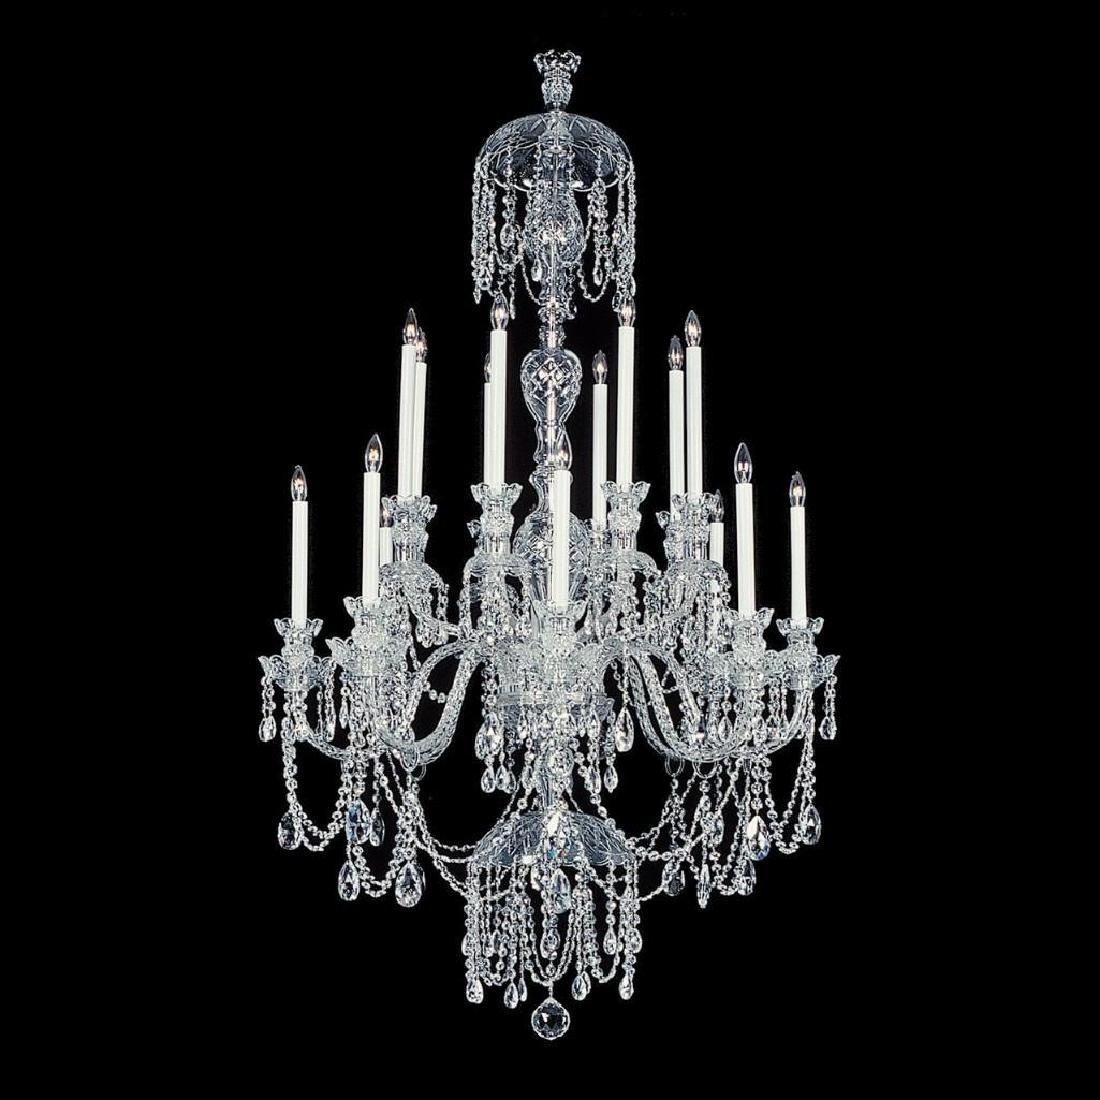 Winter Elegance - 16 Light Crystal Chandelier with